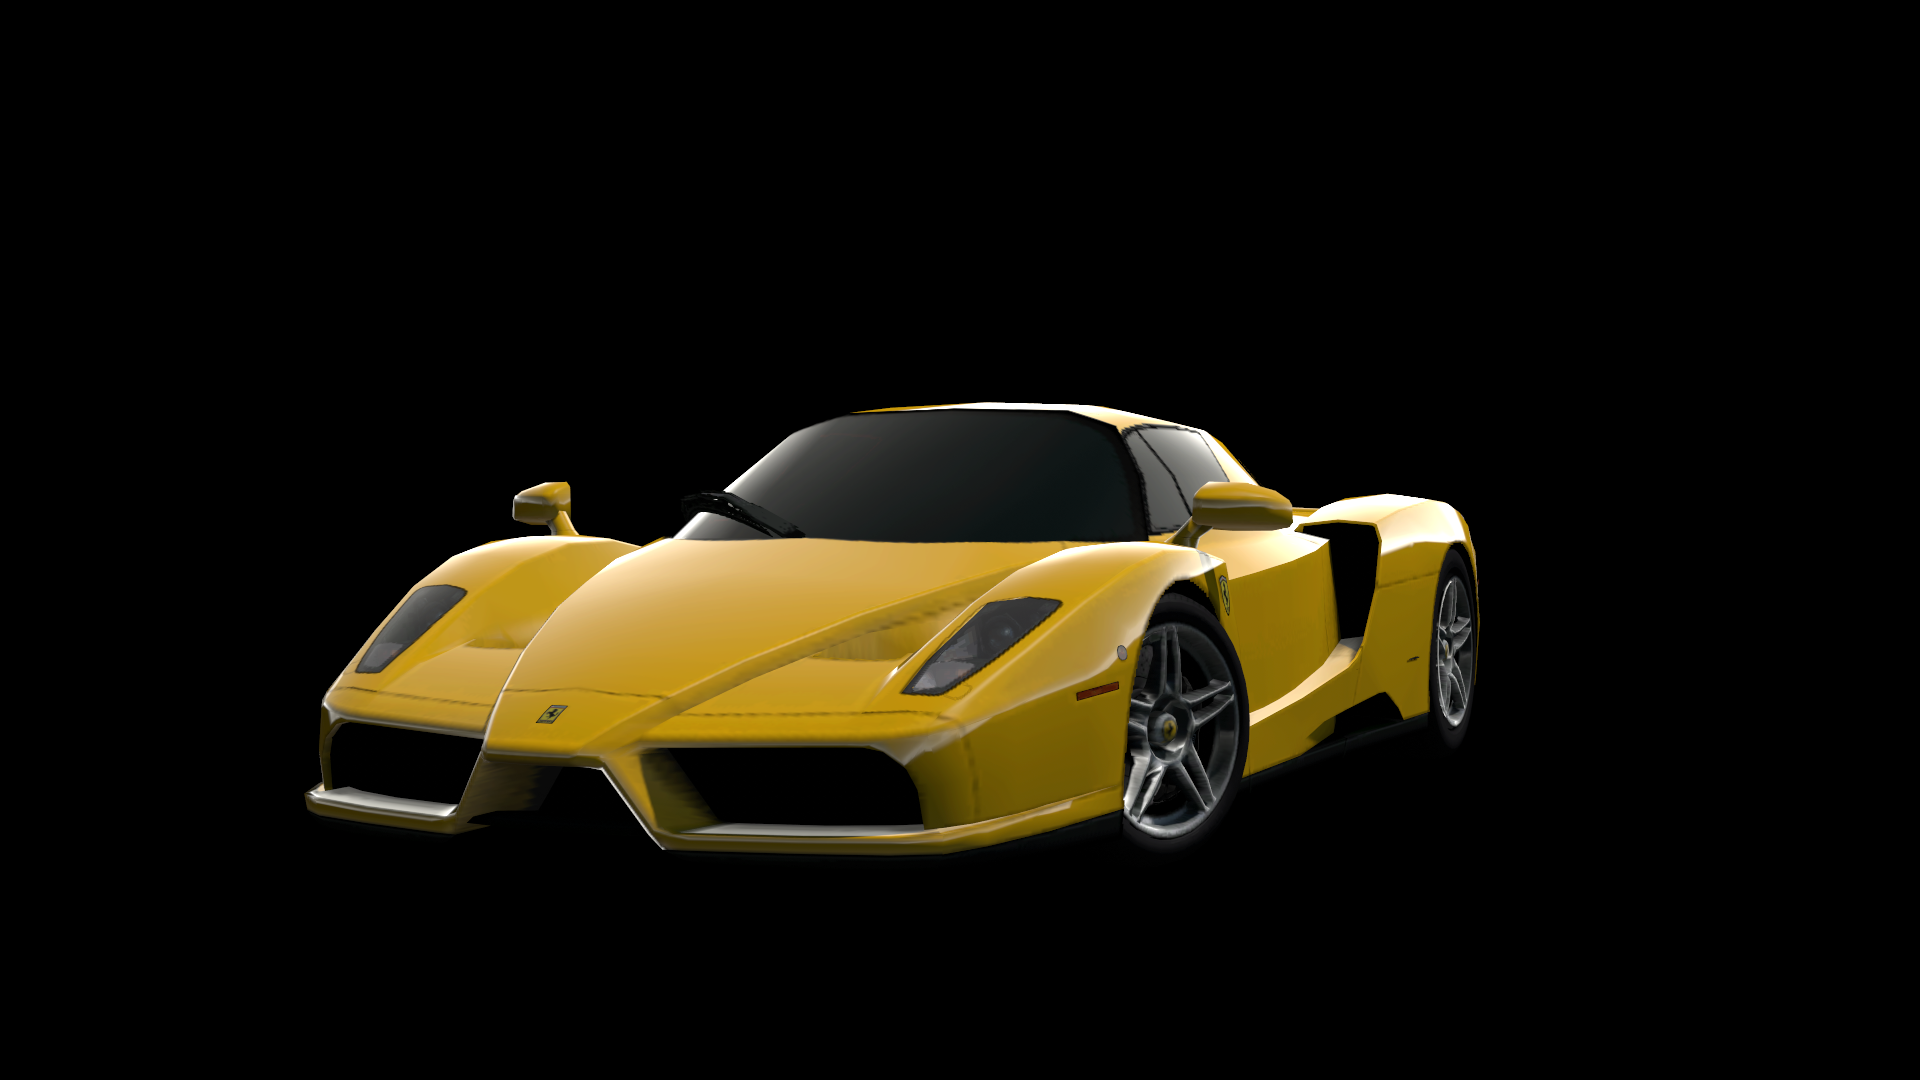 gran-turismo-psp-ferrari-enzo Fascinating Gran Turismo Psp Bugatti Veyron Price Cars Trend